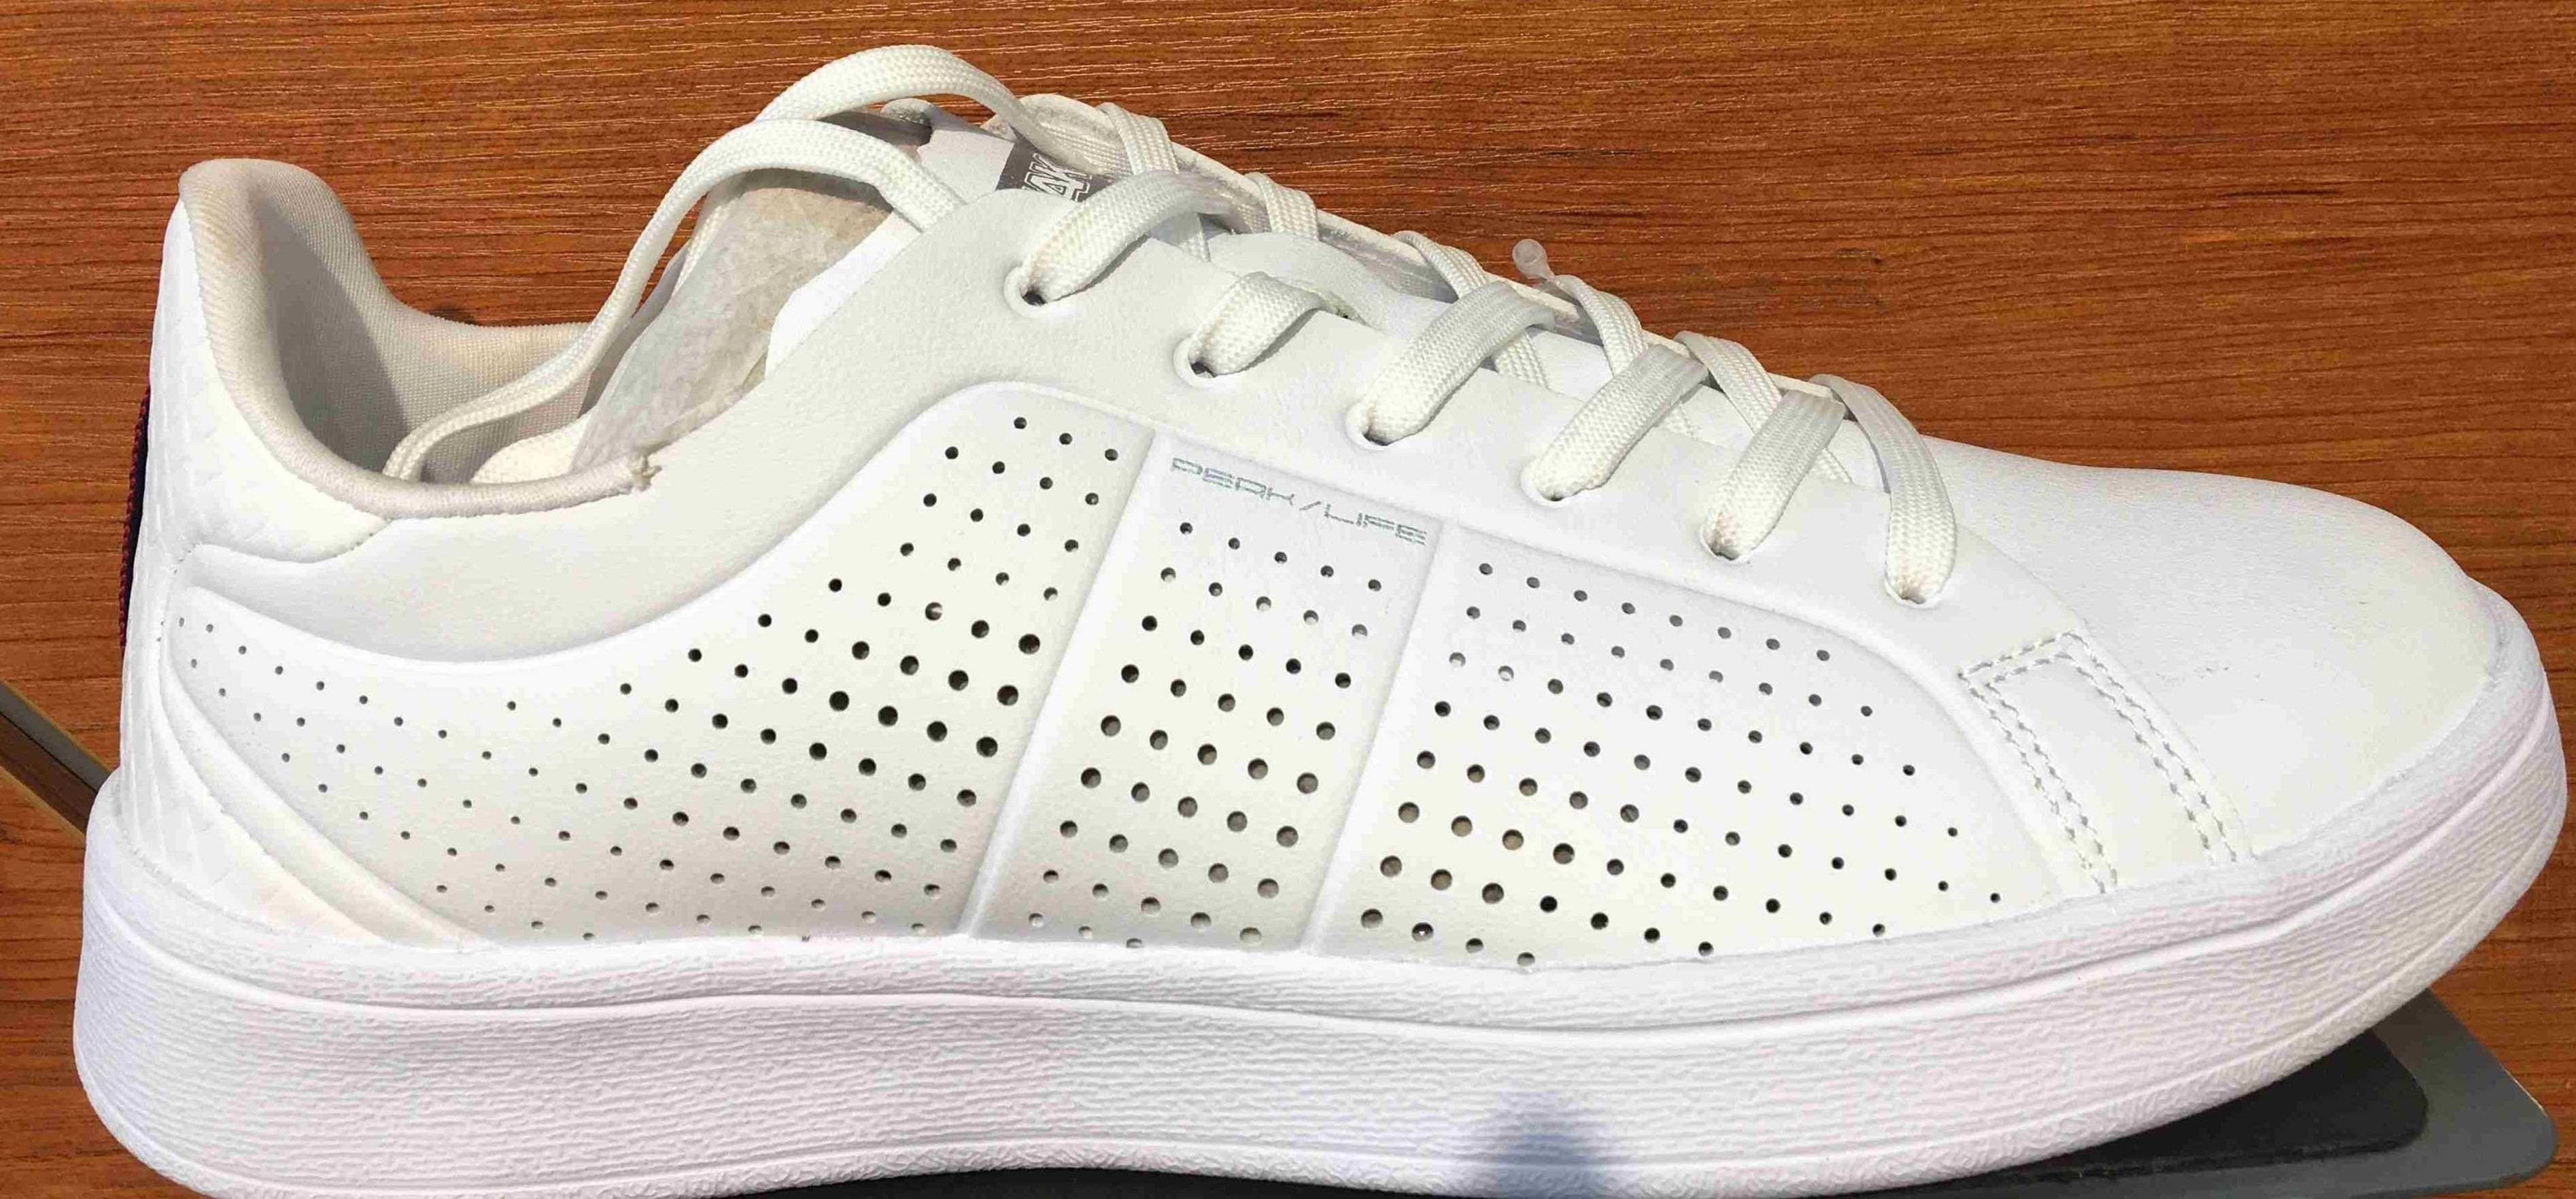 PEAK Culture Shoes For Women-EW02508B